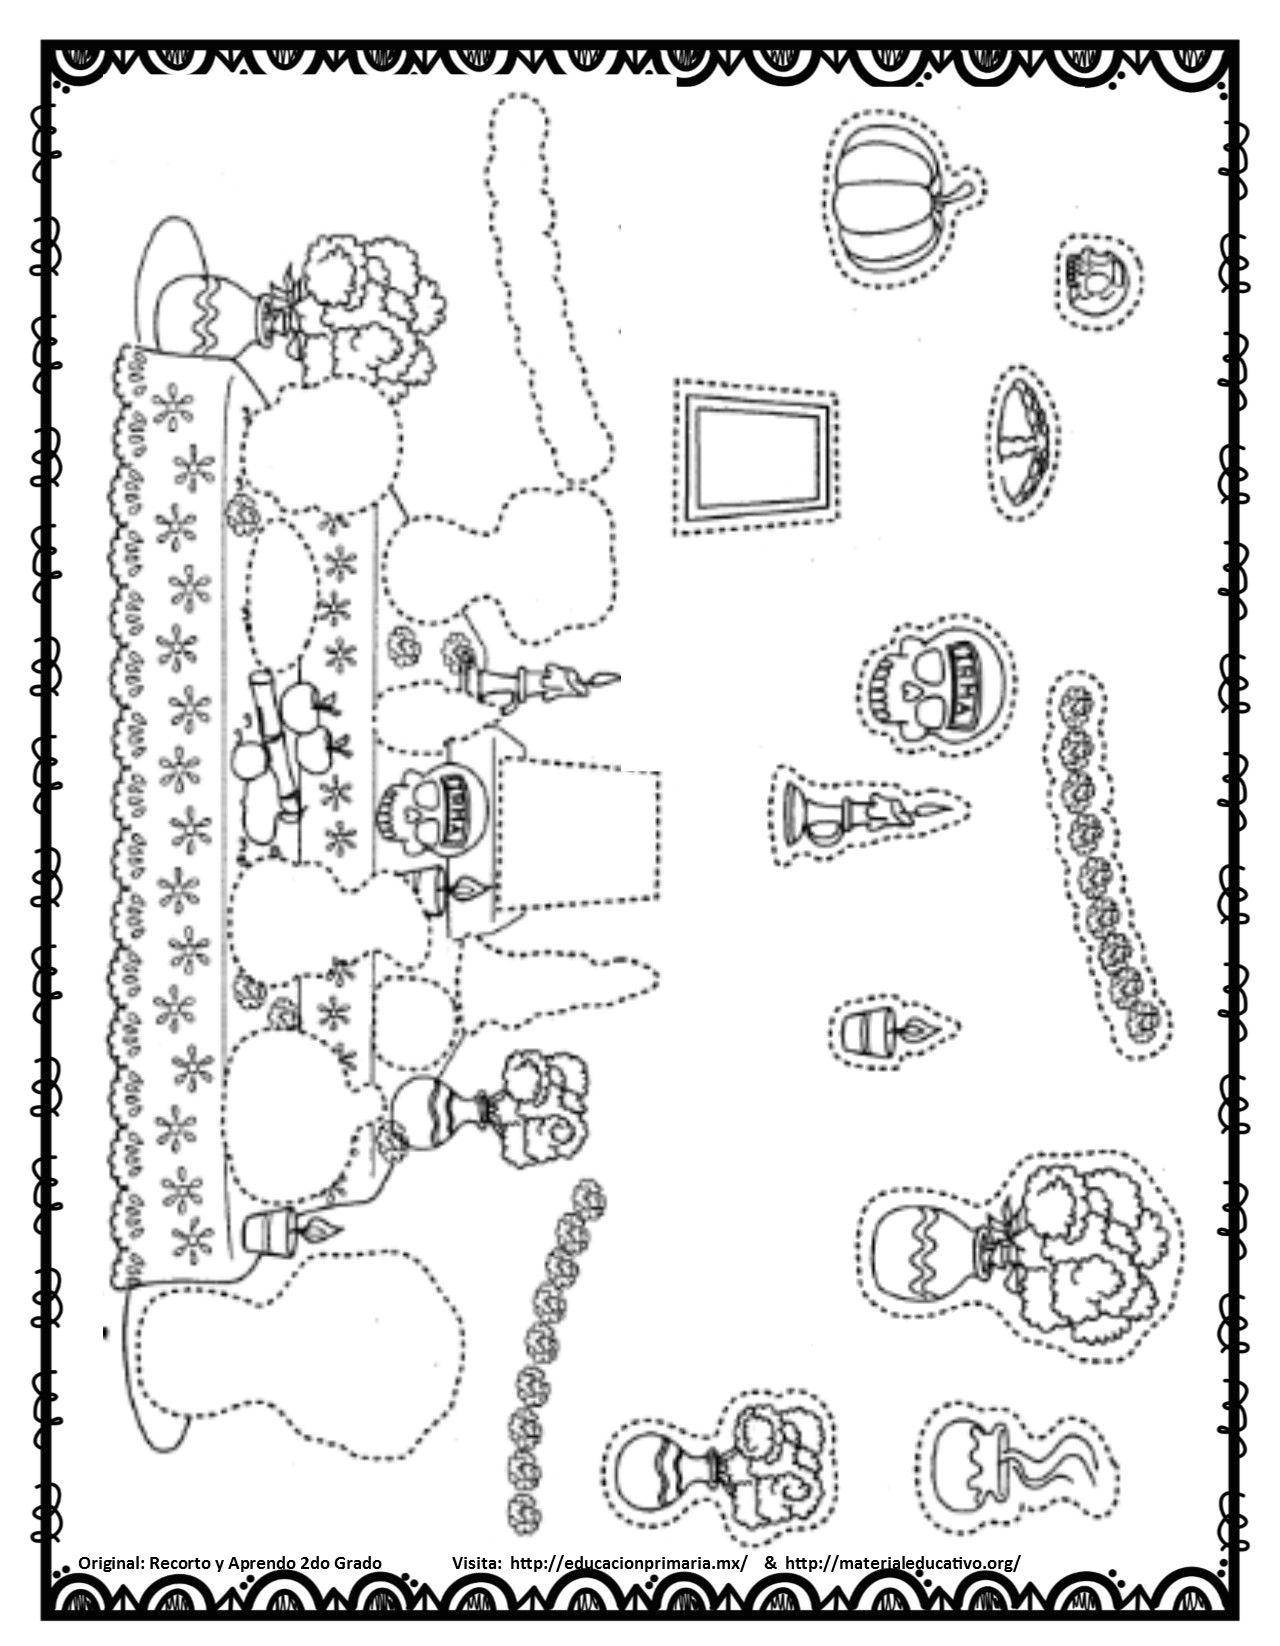 Dia D Muertos Actividades Dia De Muertos Altar De Muertos Dibujo Dibujo Dia De Muertos